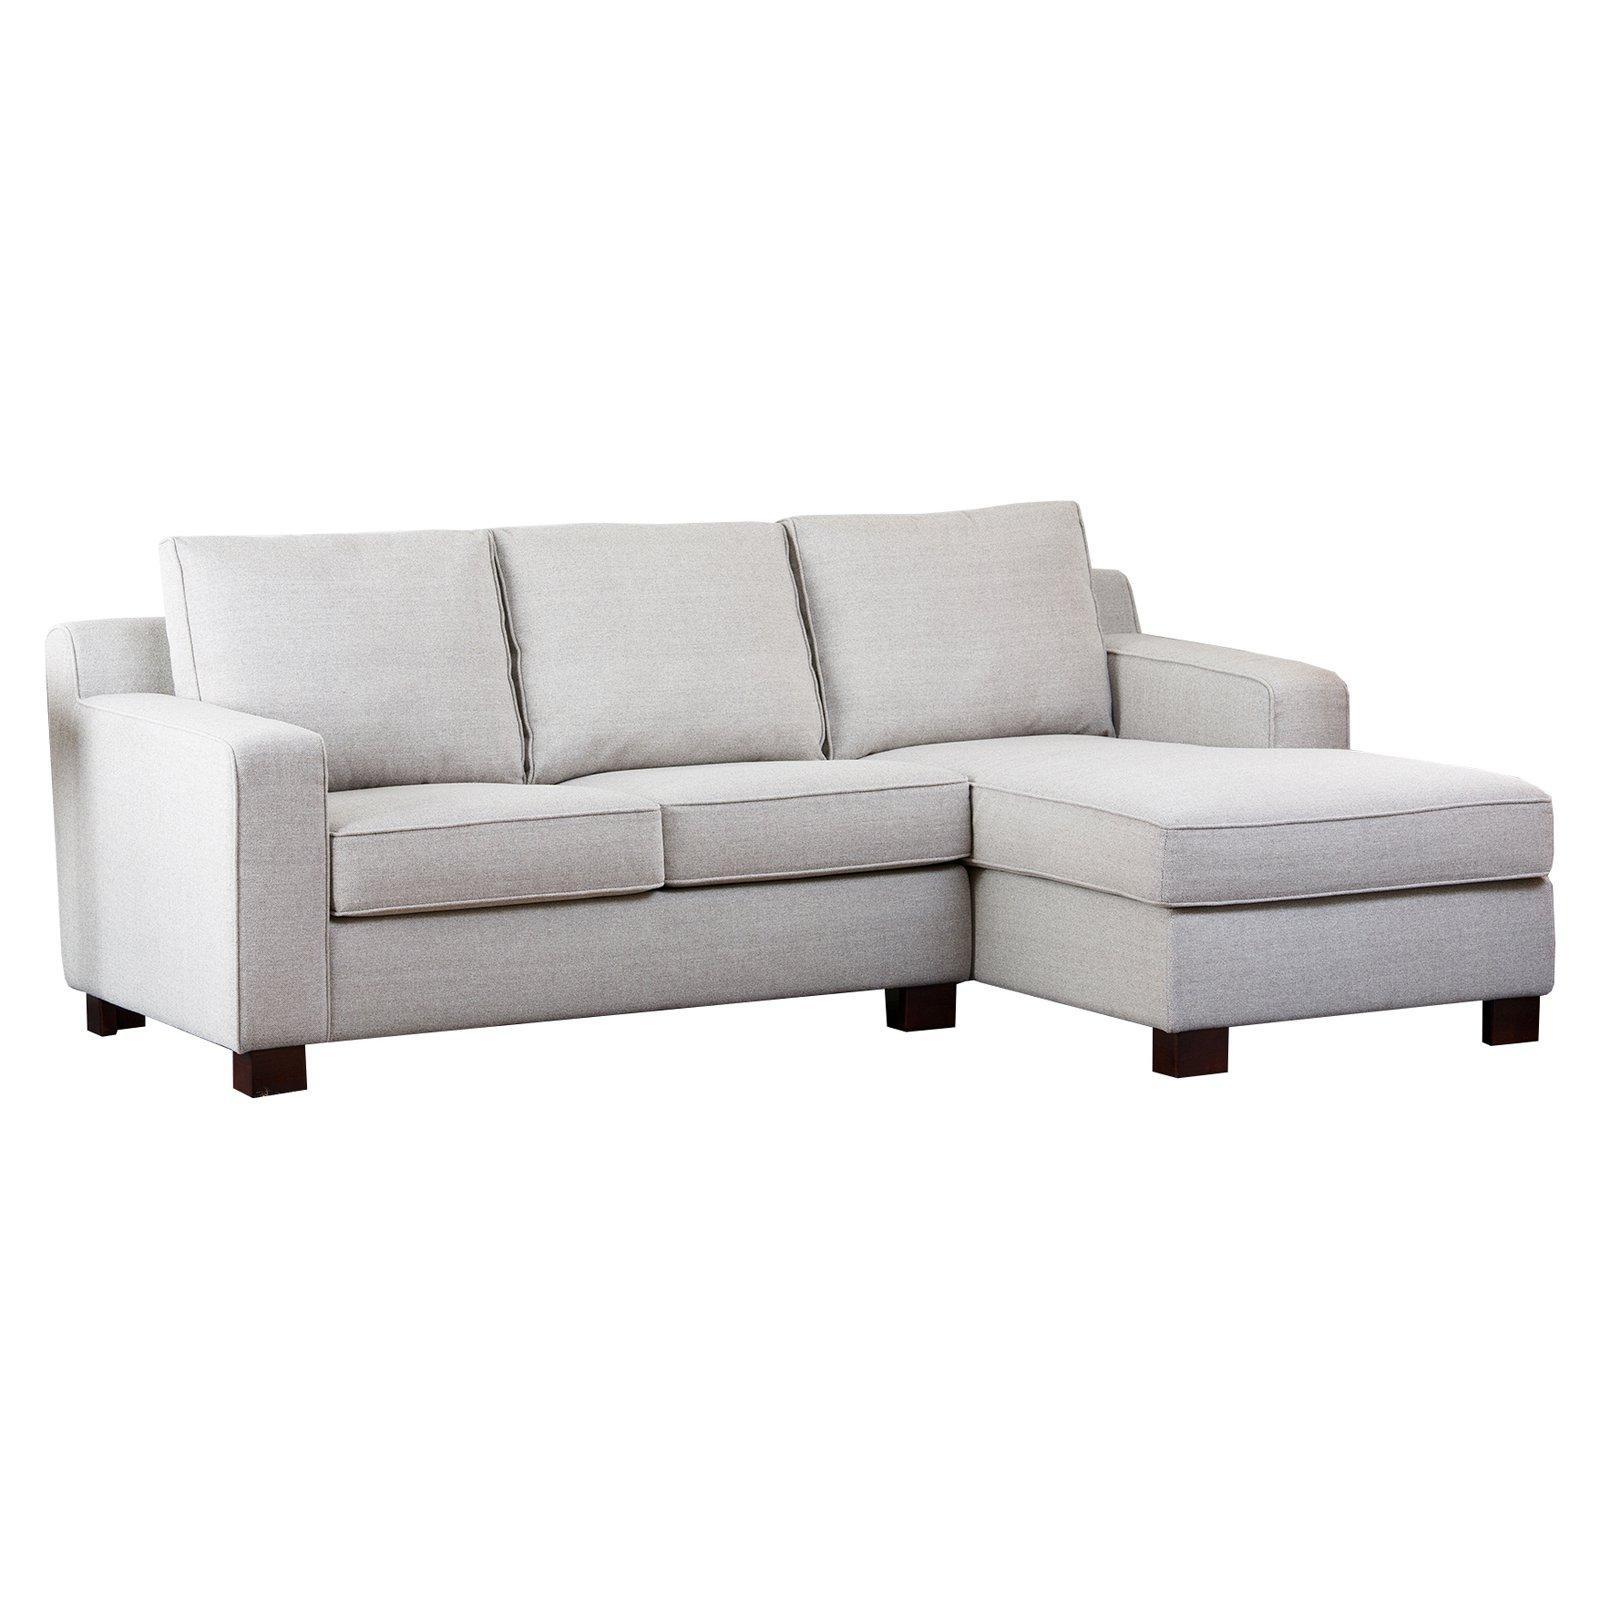 Abbyson Regina Sectional Sofa – Gray | Hayneedle Within Abbyson Sectional Sofas (Image 9 of 20)